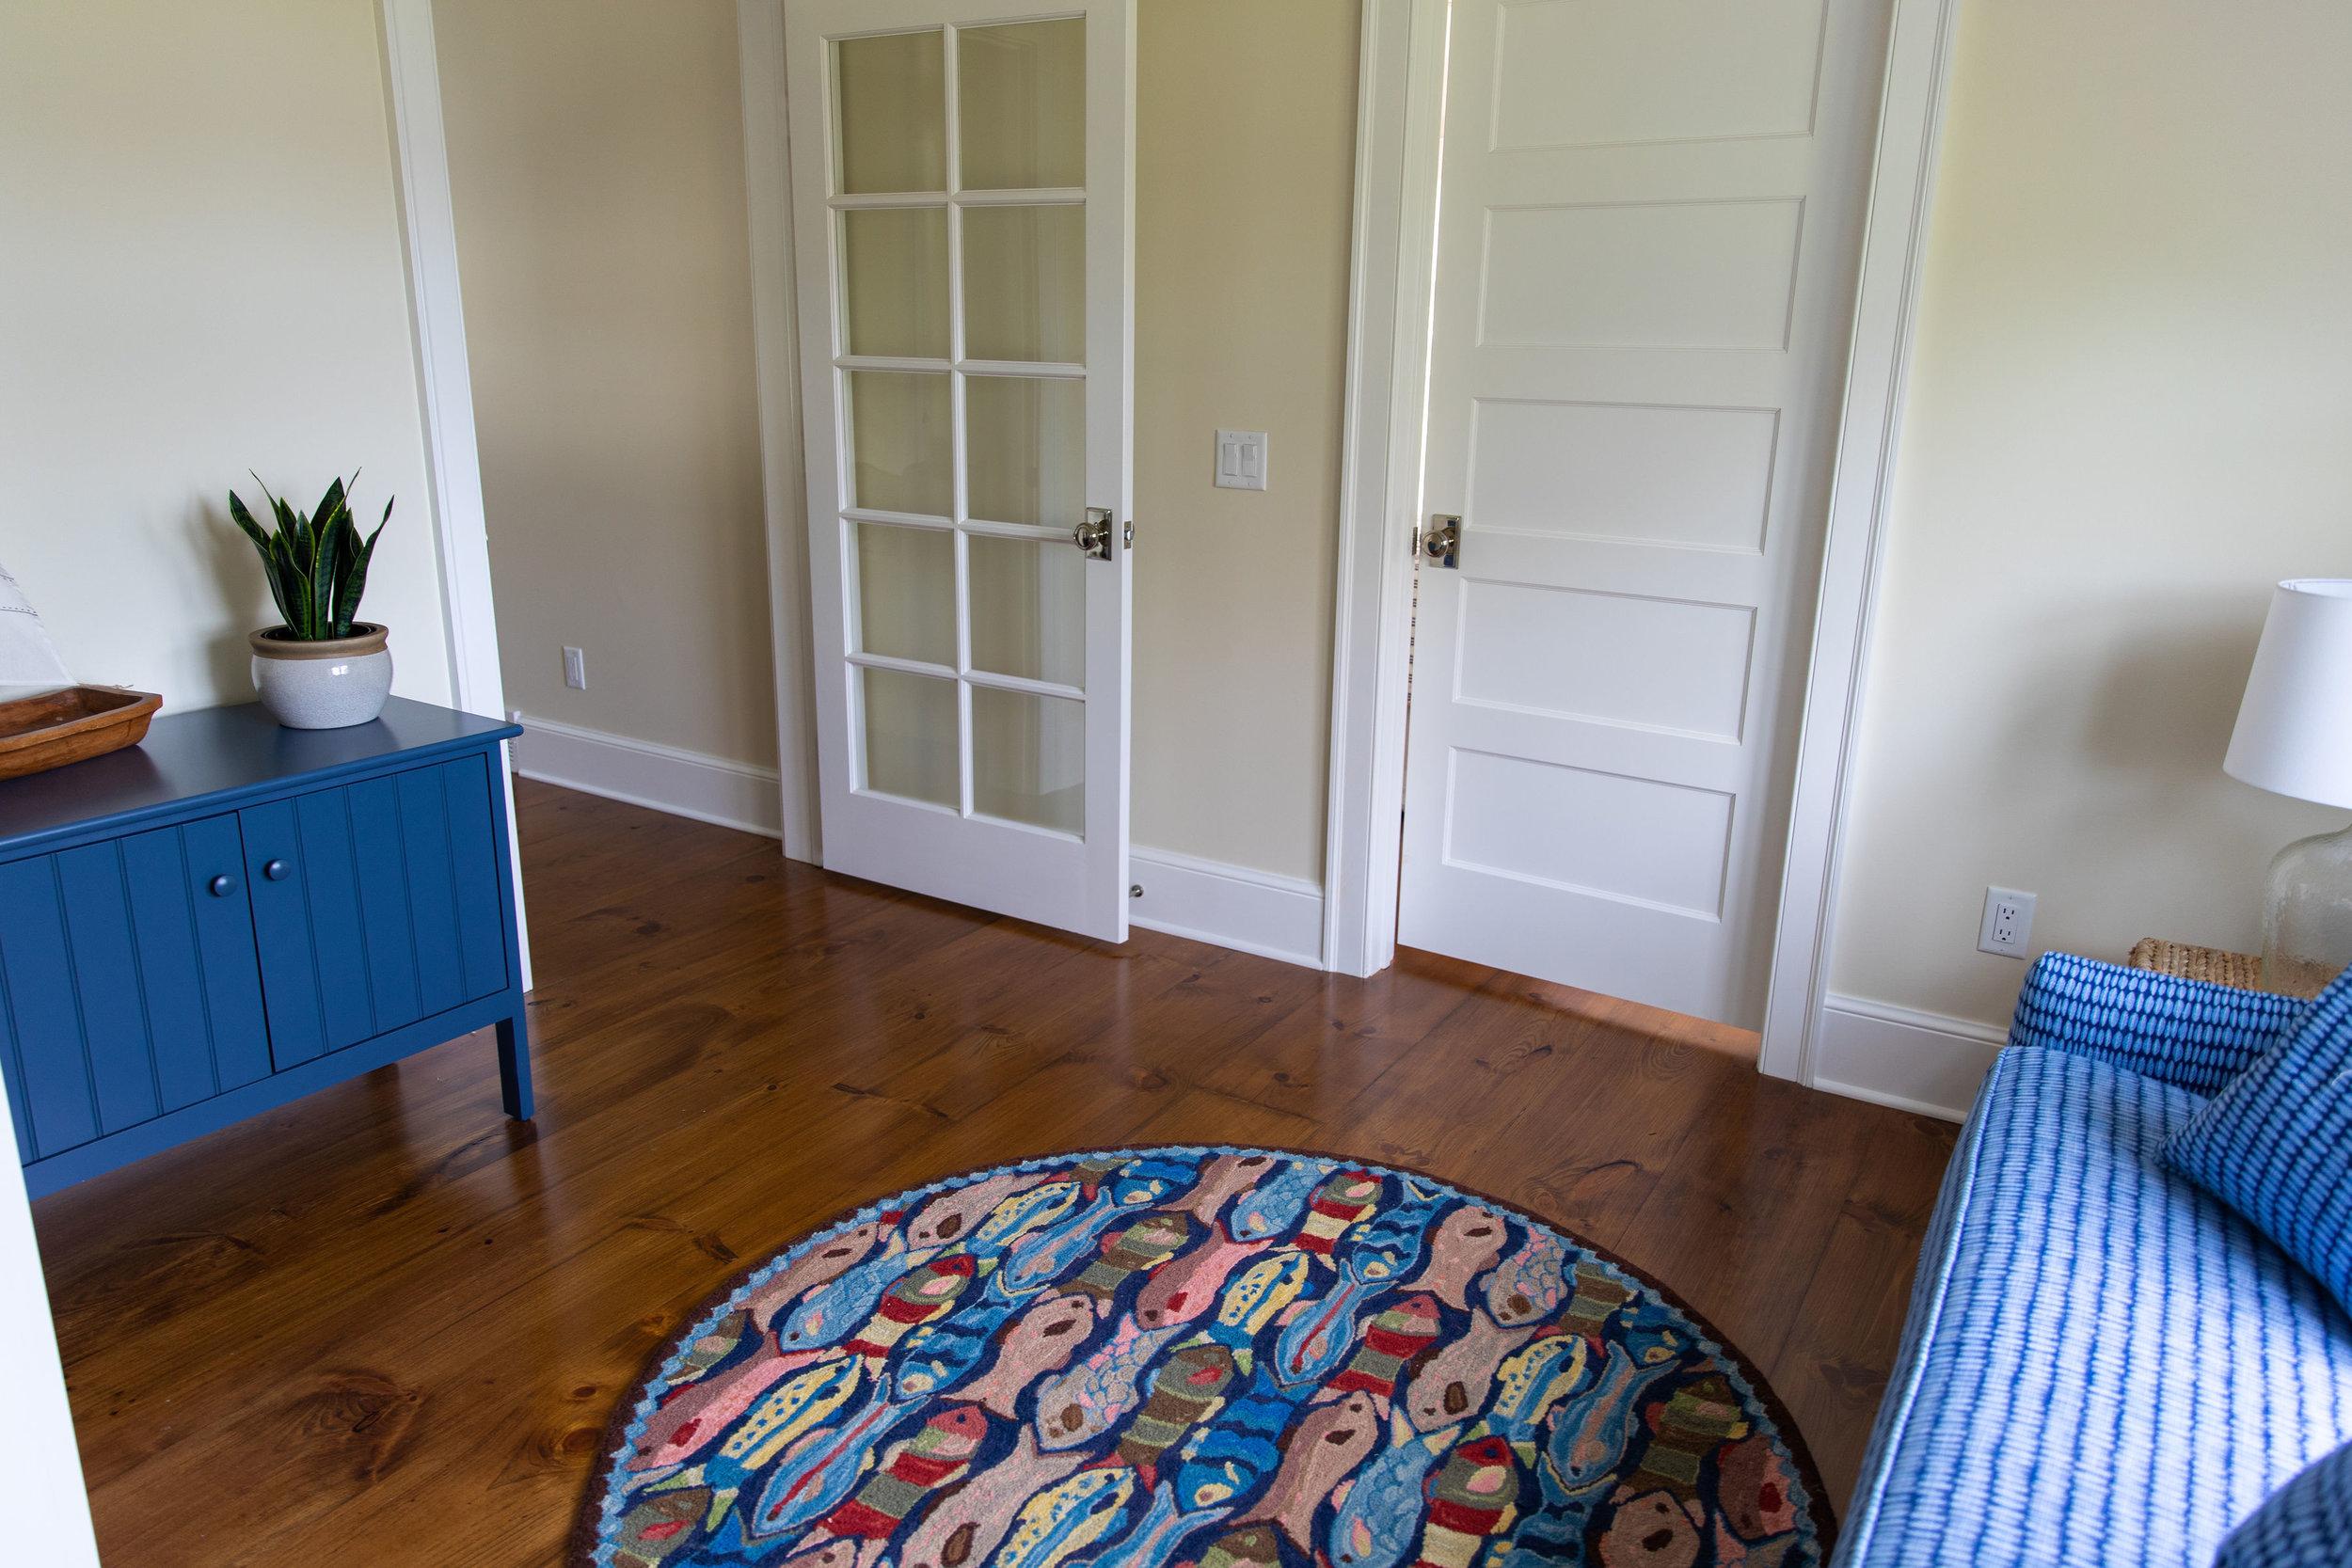 Small house interior designLudlow VT / Skaneateles, NY interior designer Teaselwood Design